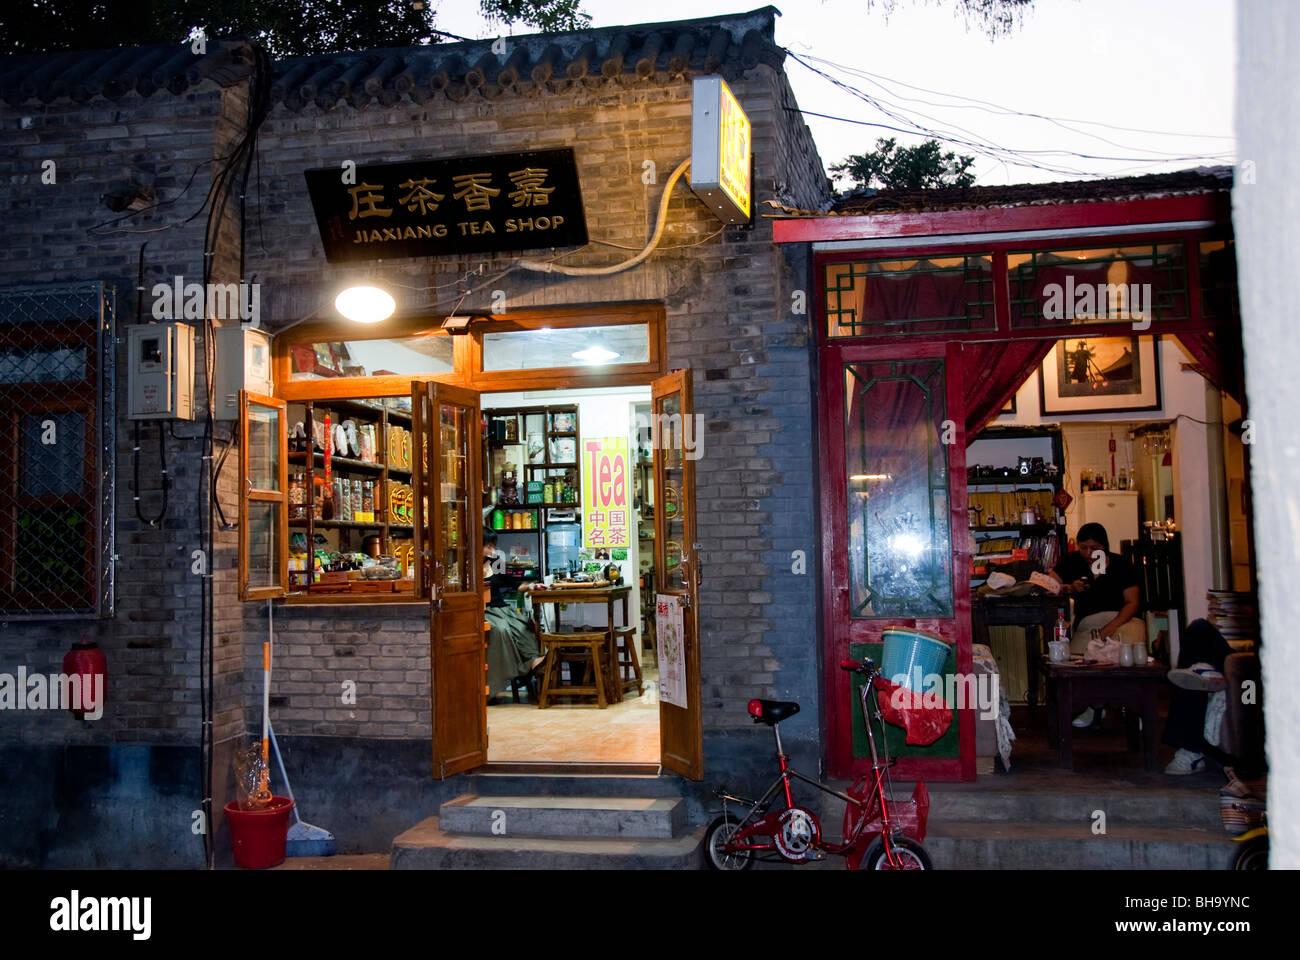 asian tea shop jpg 1200x900